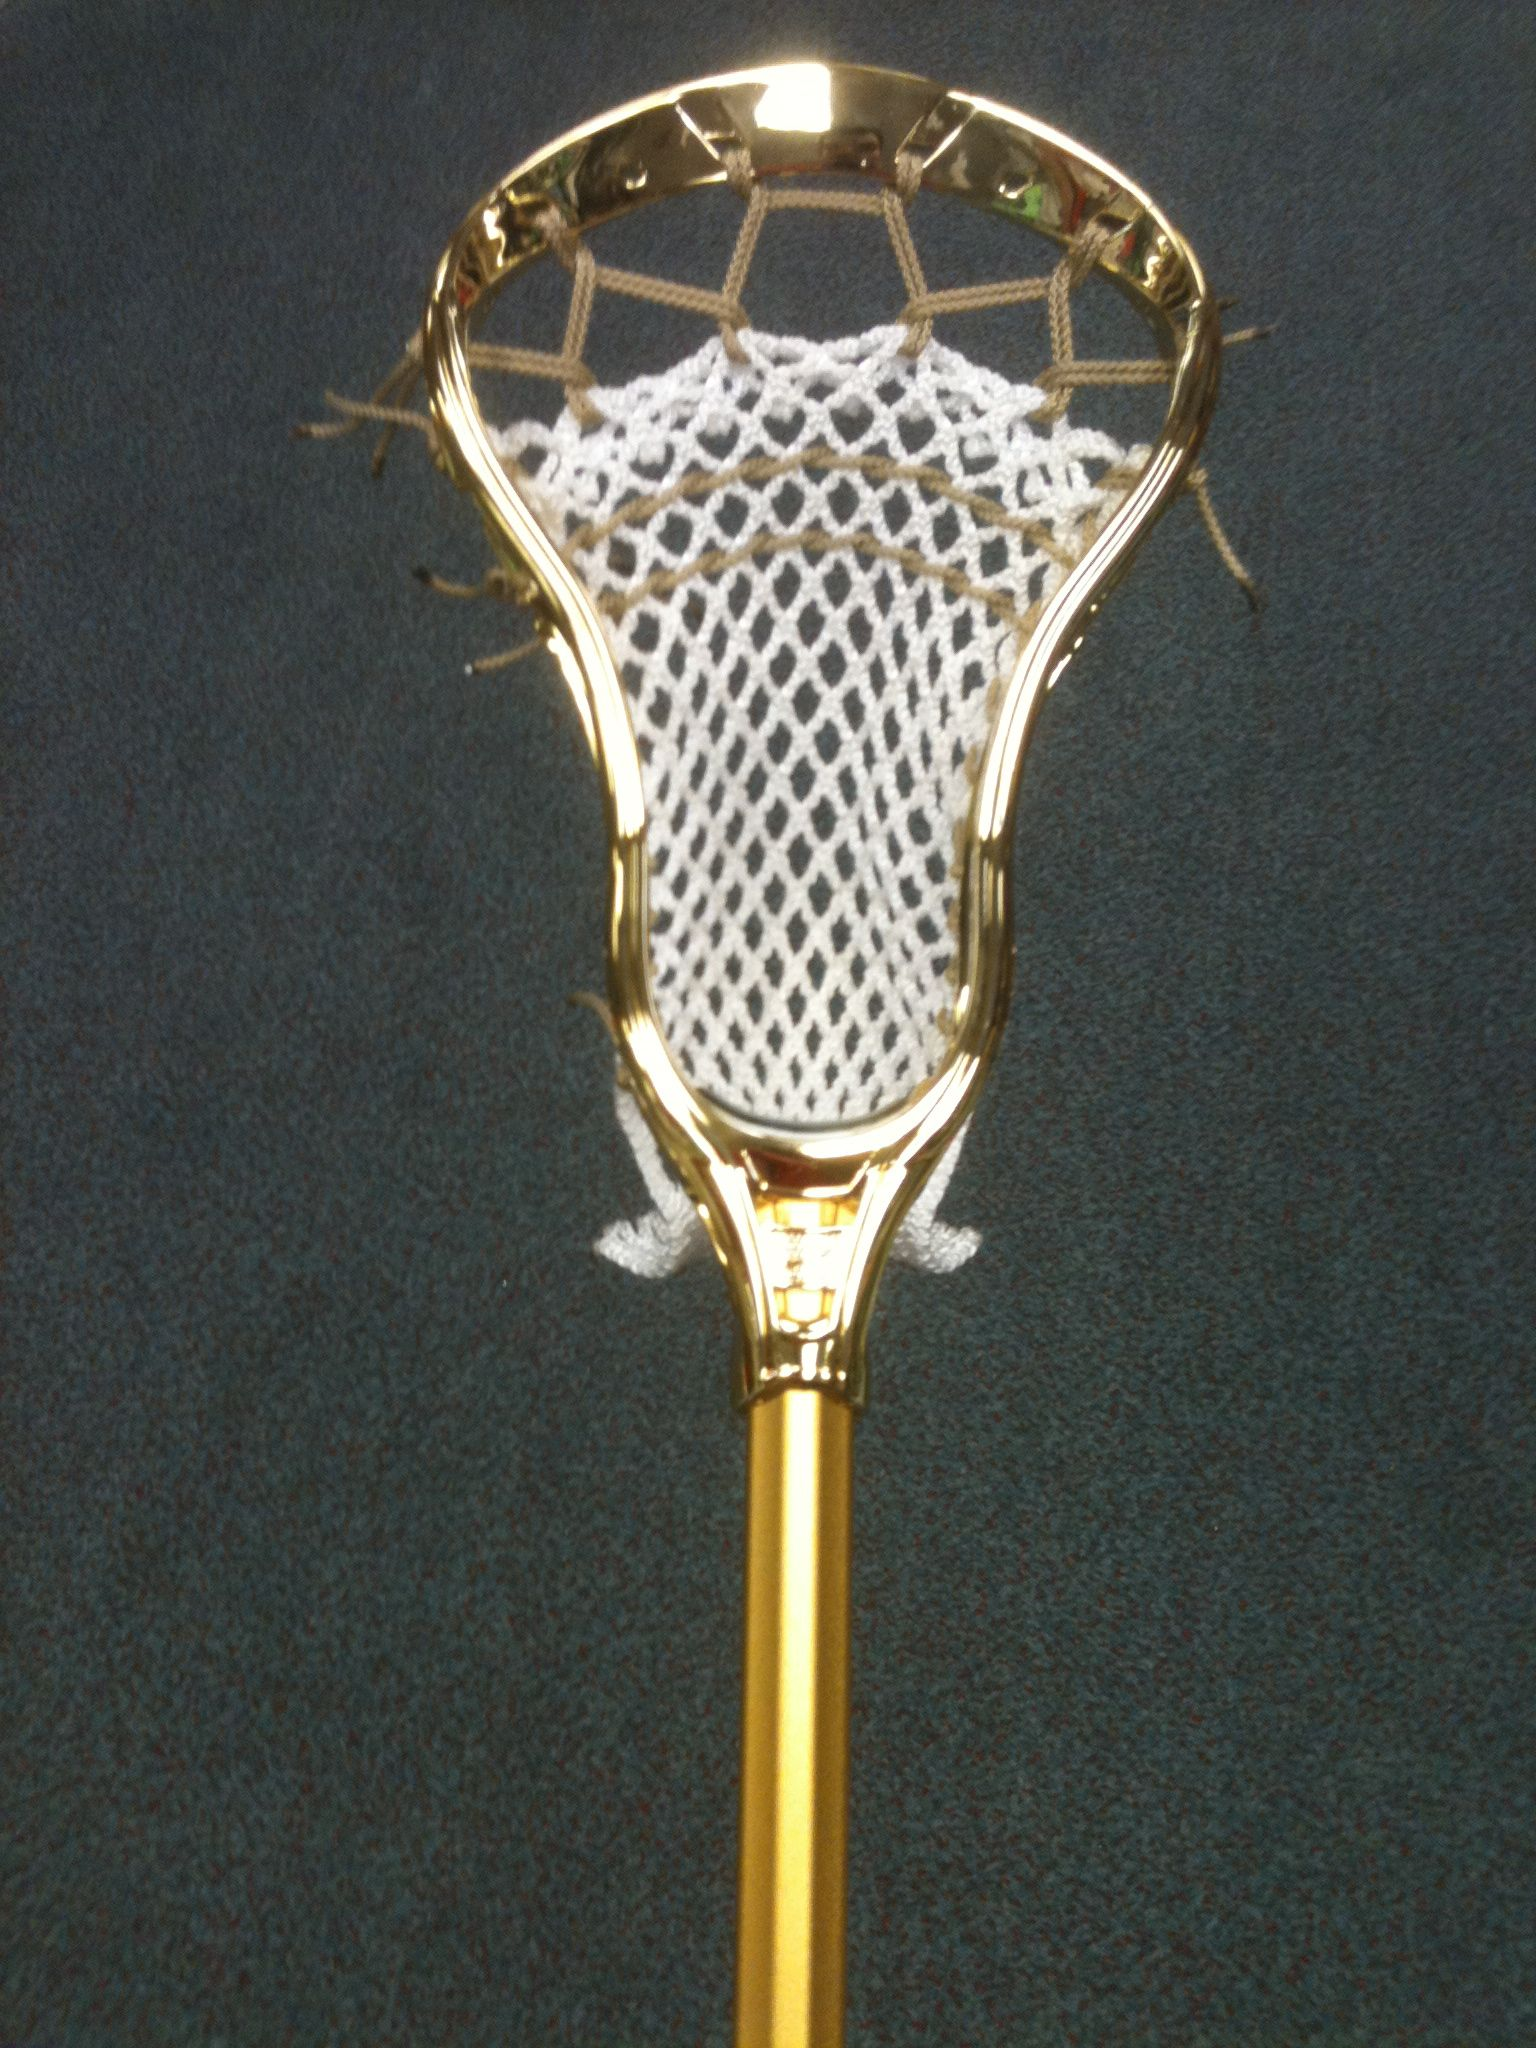 Laxunation Lacrosse Unlimited S Blog Page 73 Lacrosse Tennis Racket